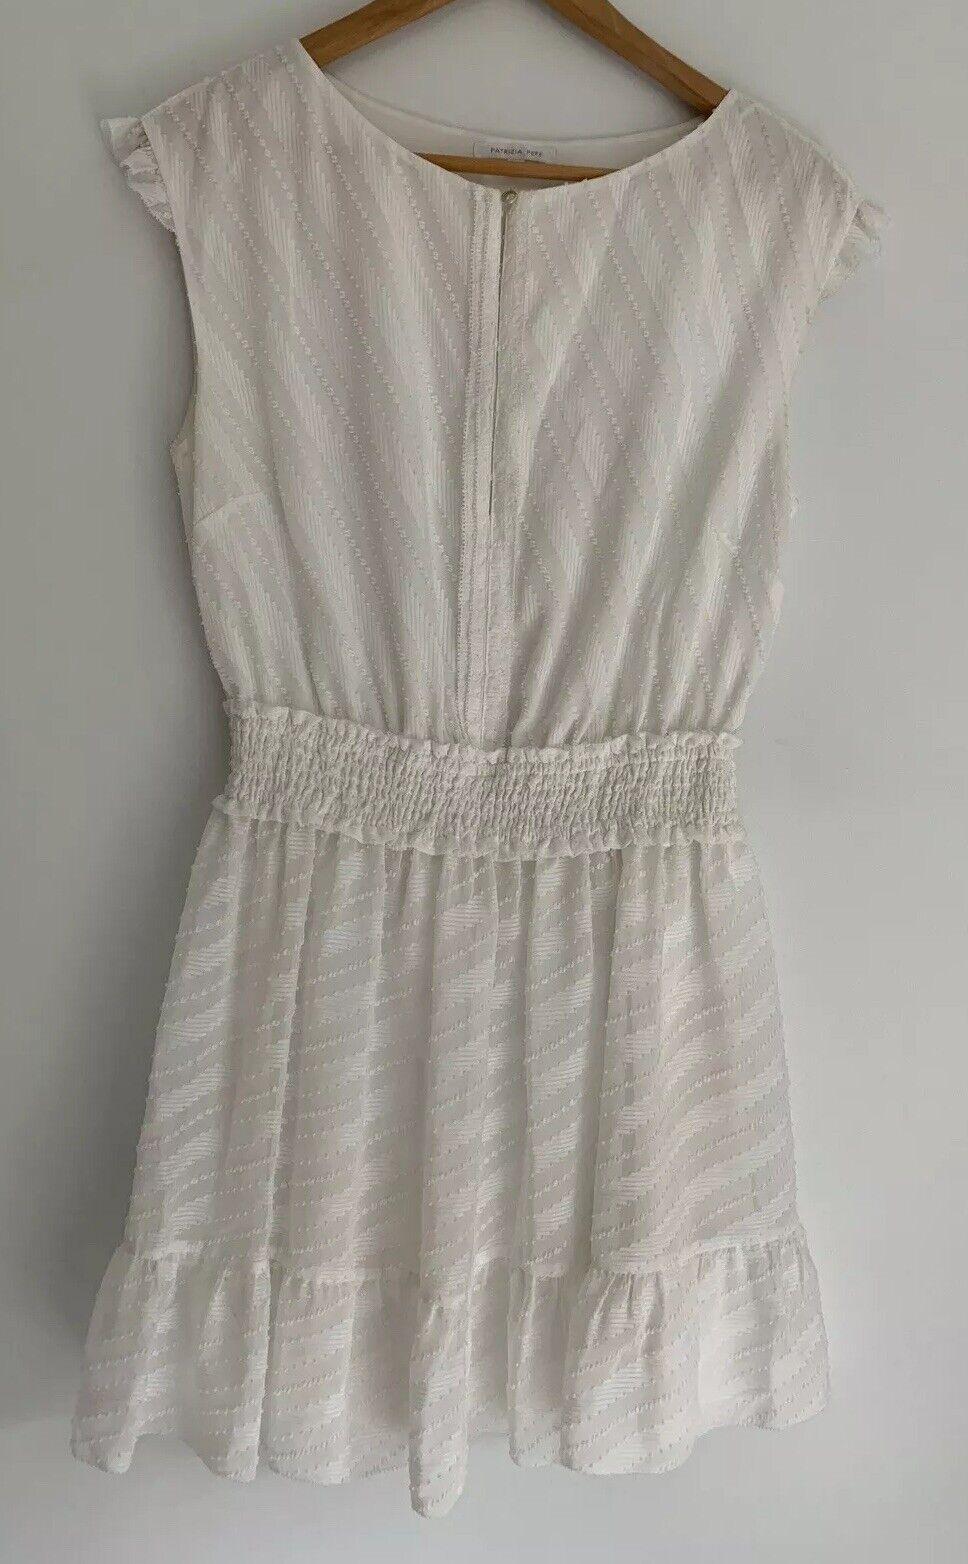 PATRIZIA PEPE divine Texturot Weiß Mini Dress Größe 8-10 AU